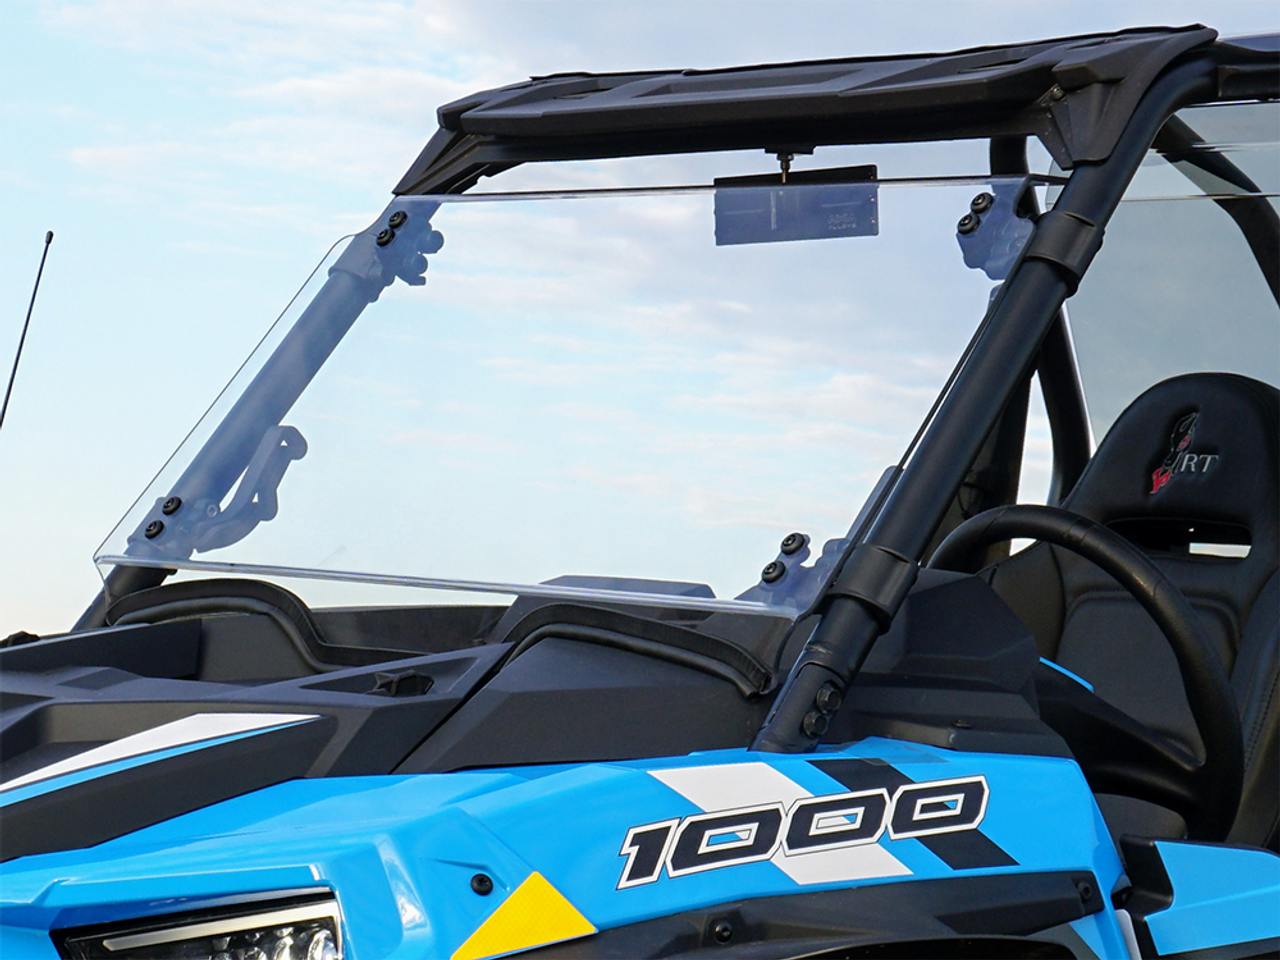 Polaris Rzr 1000 Windshield >> Polaris Rzr Xp 1000 Turbo Full Tilting Windshield